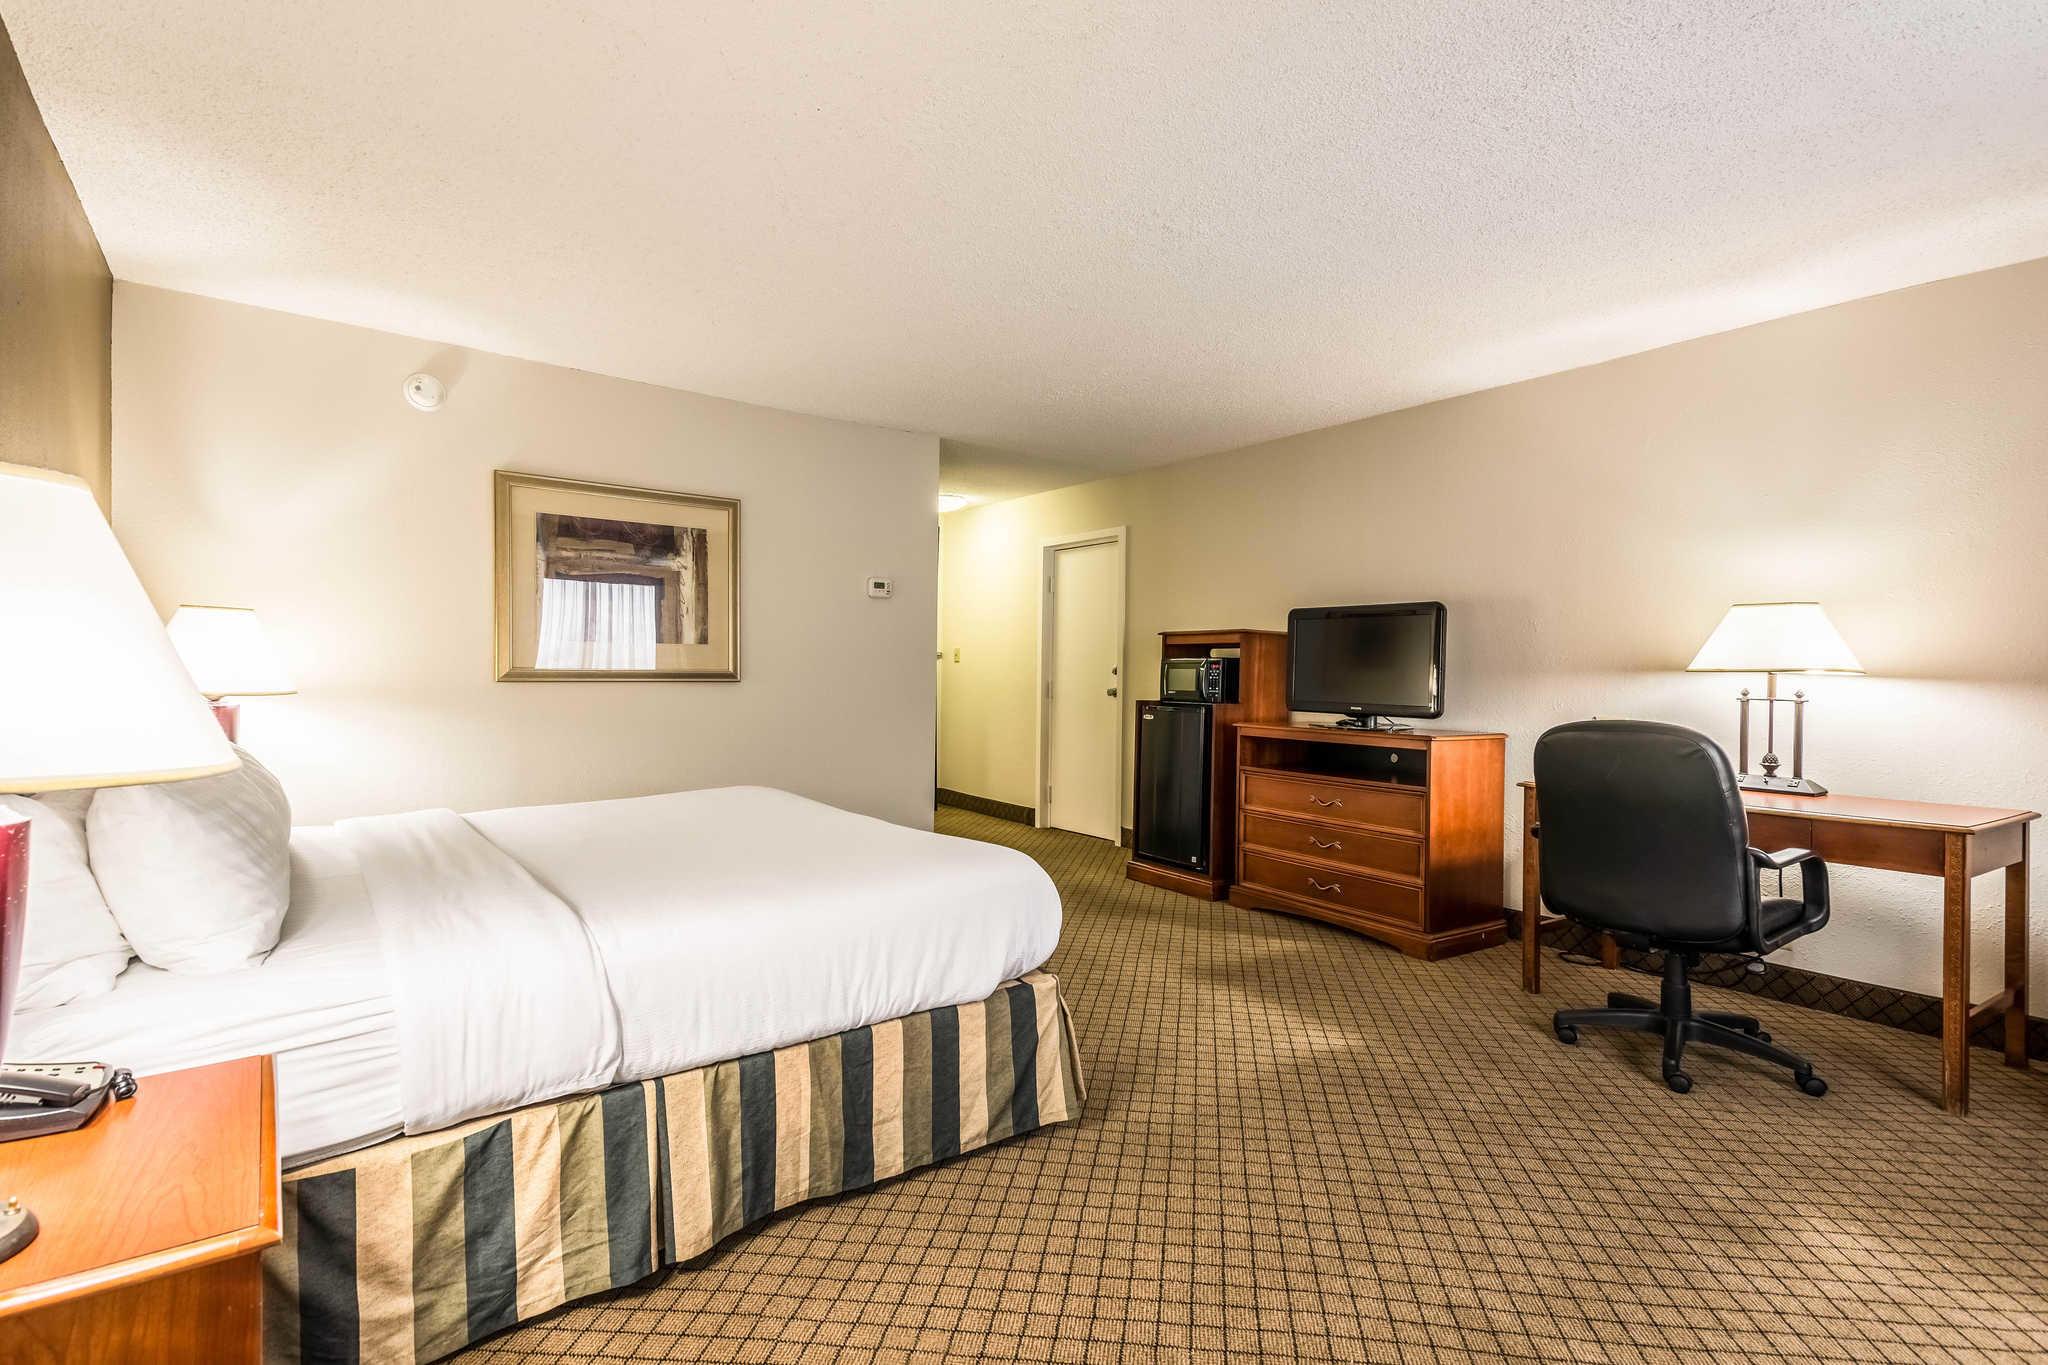 Quality Inn near Finger Lakes and Seneca Falls image 18